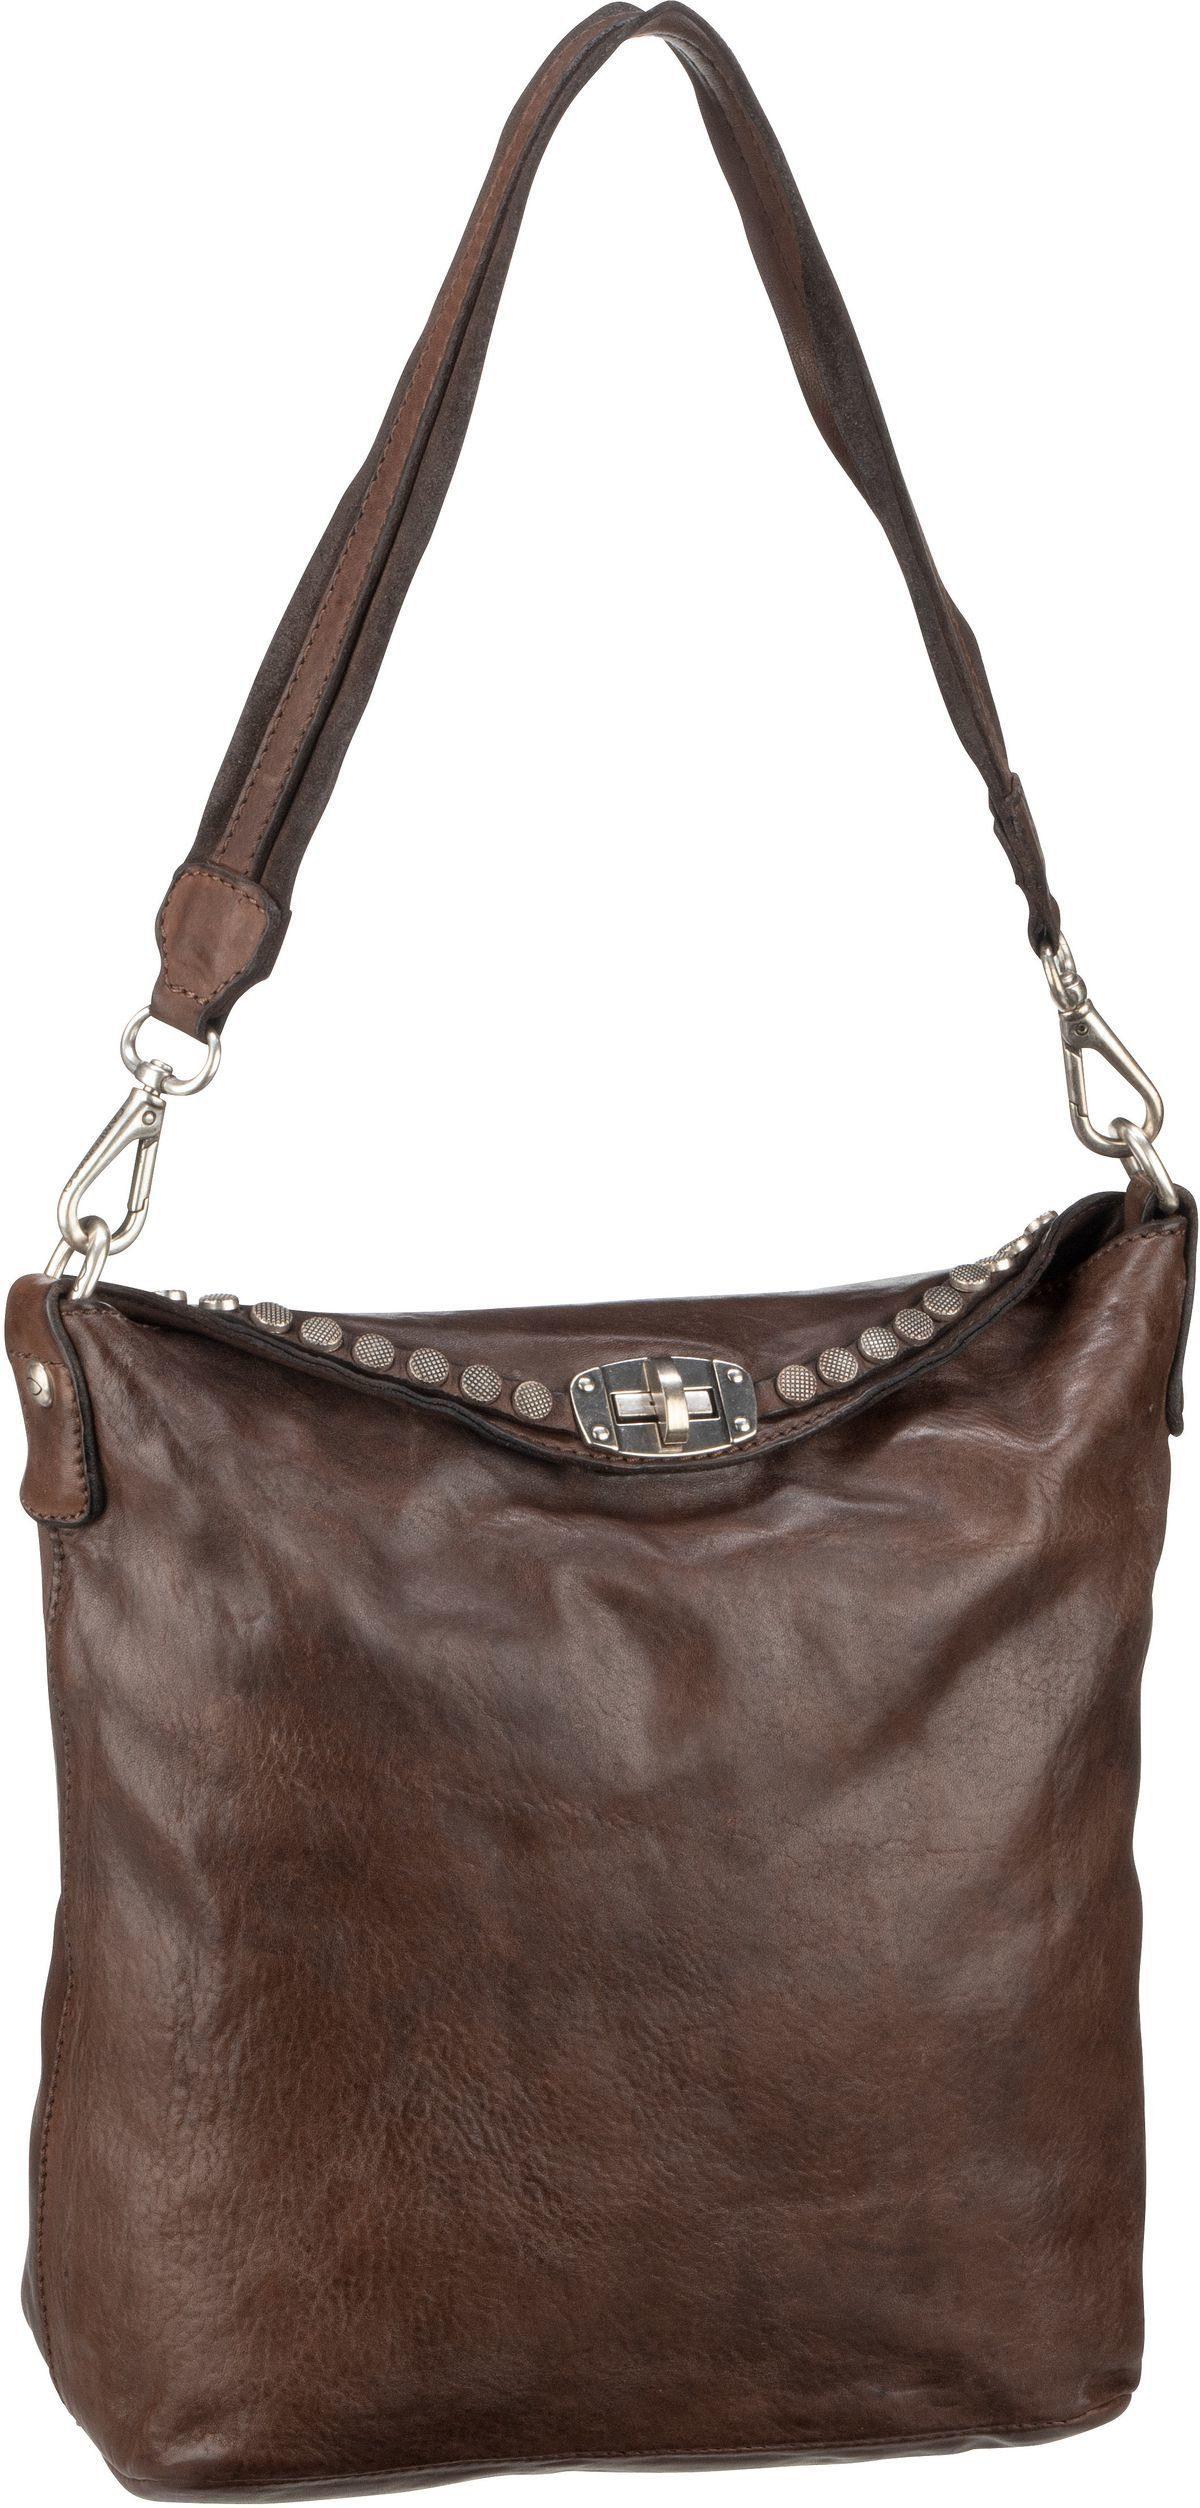 Campomaggi Handtasche »Artemide C16790«, Beuteltasche Hobo Bag online kaufen | OTTO